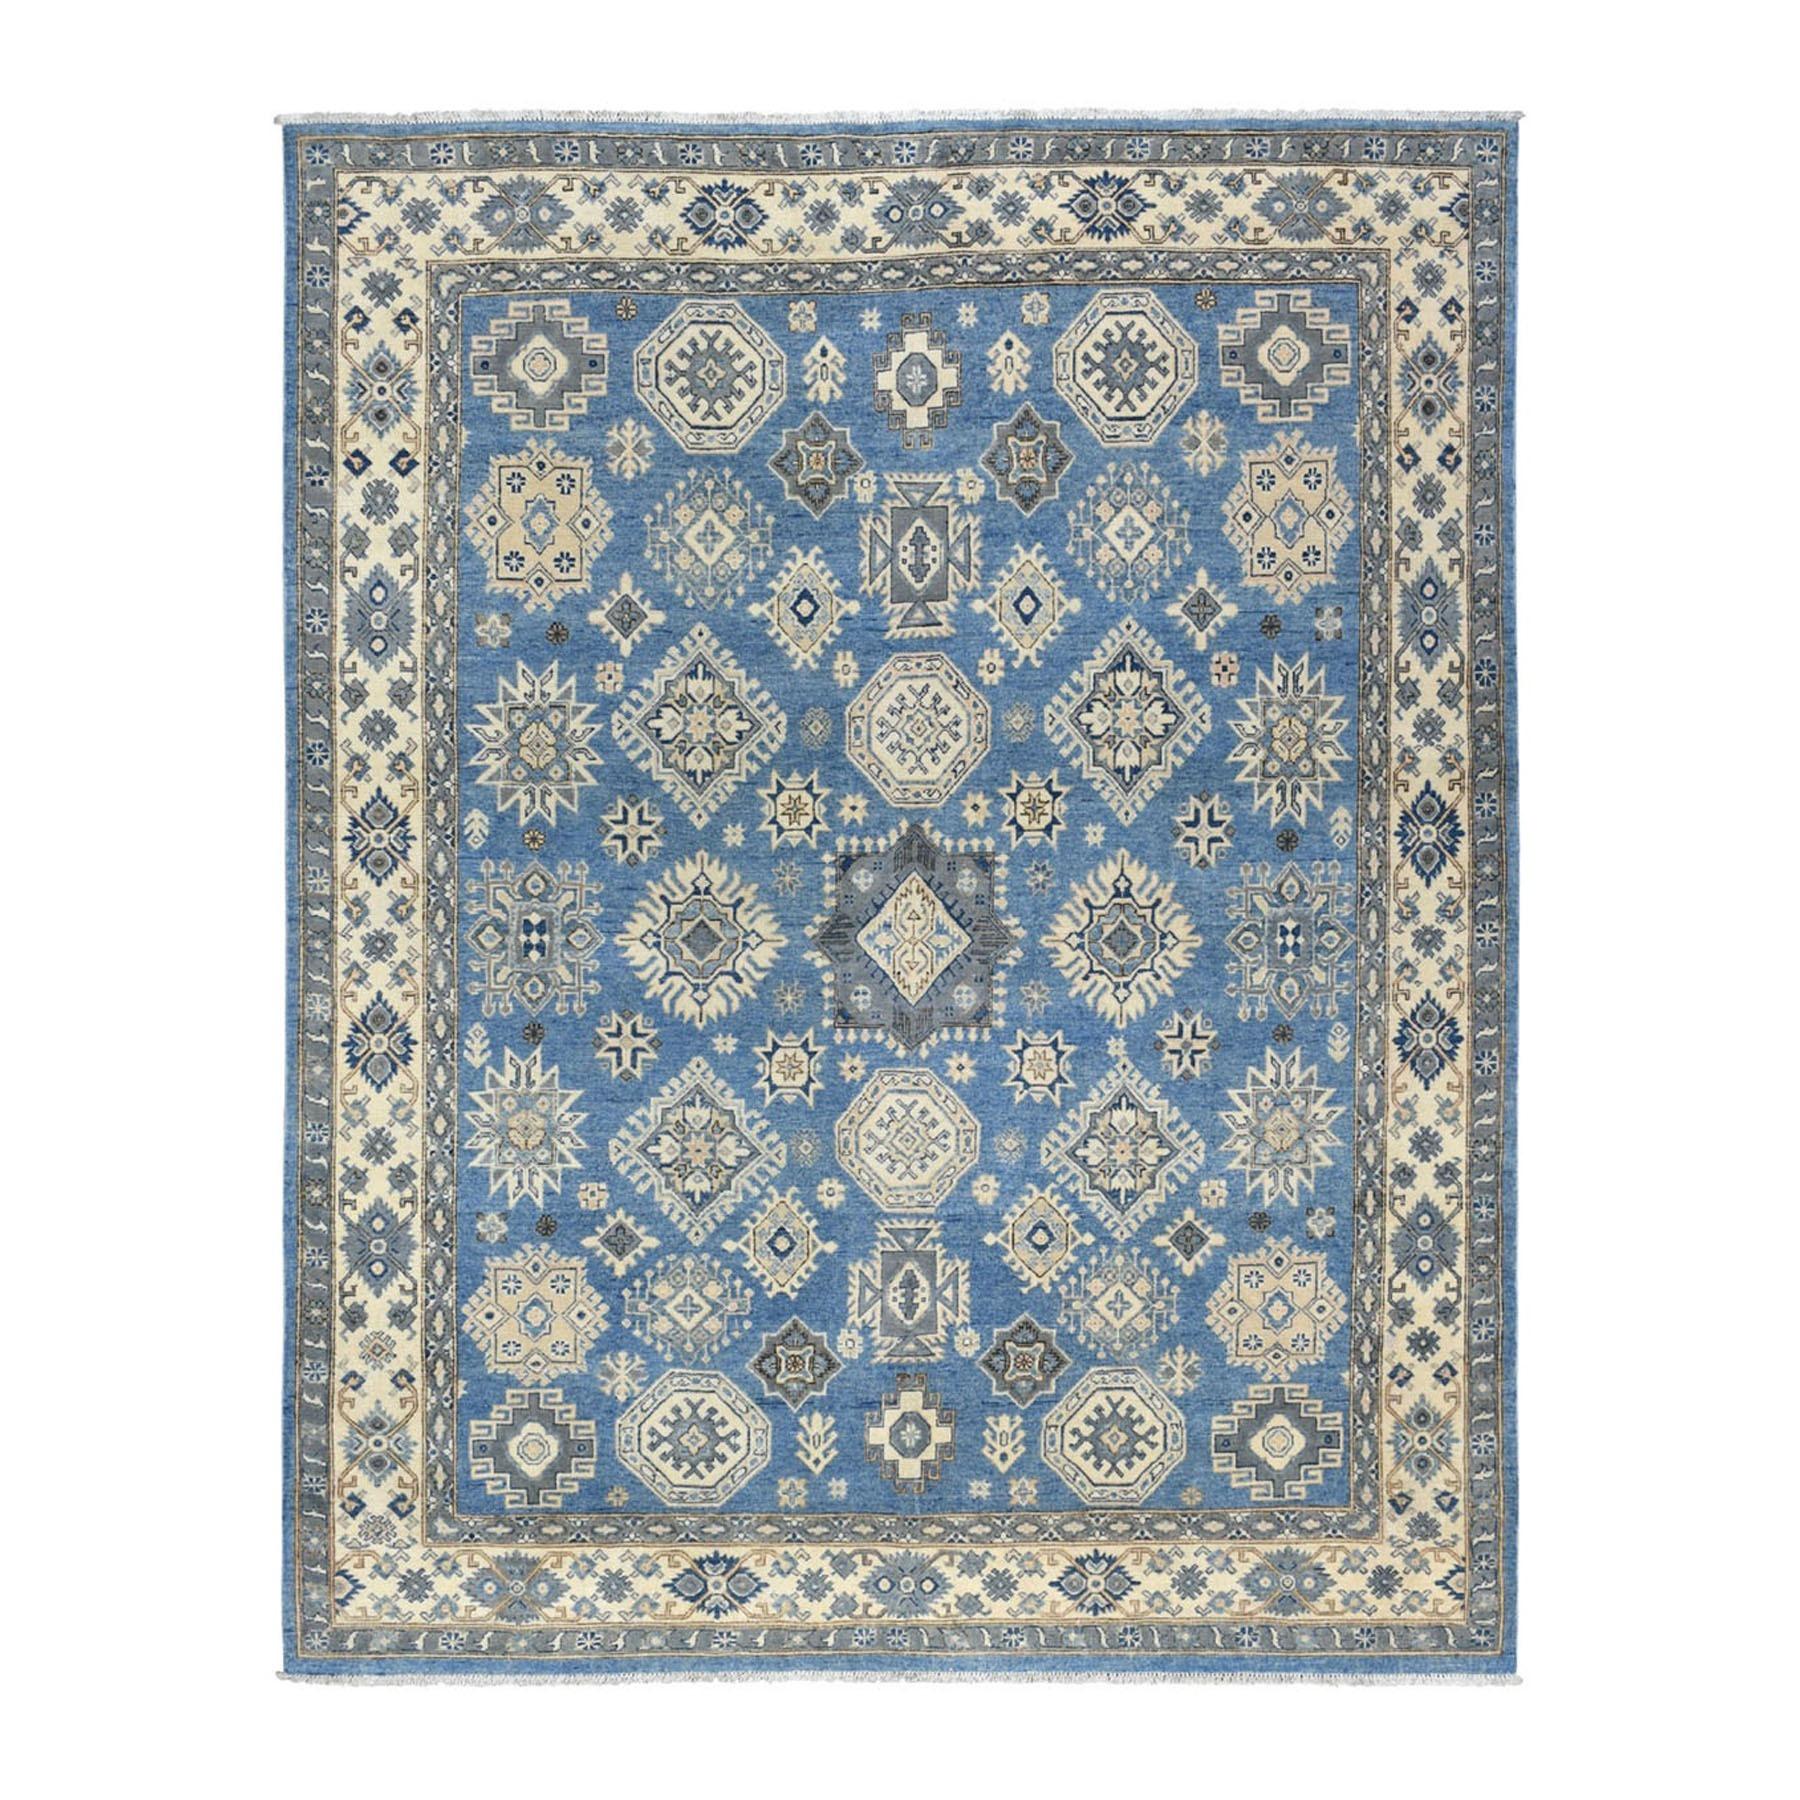 "8'x9'9"" Blue Afghan Vintage Look Kazak All Over Design Organic Wool Hand Knotted Oriental Rug 54778"